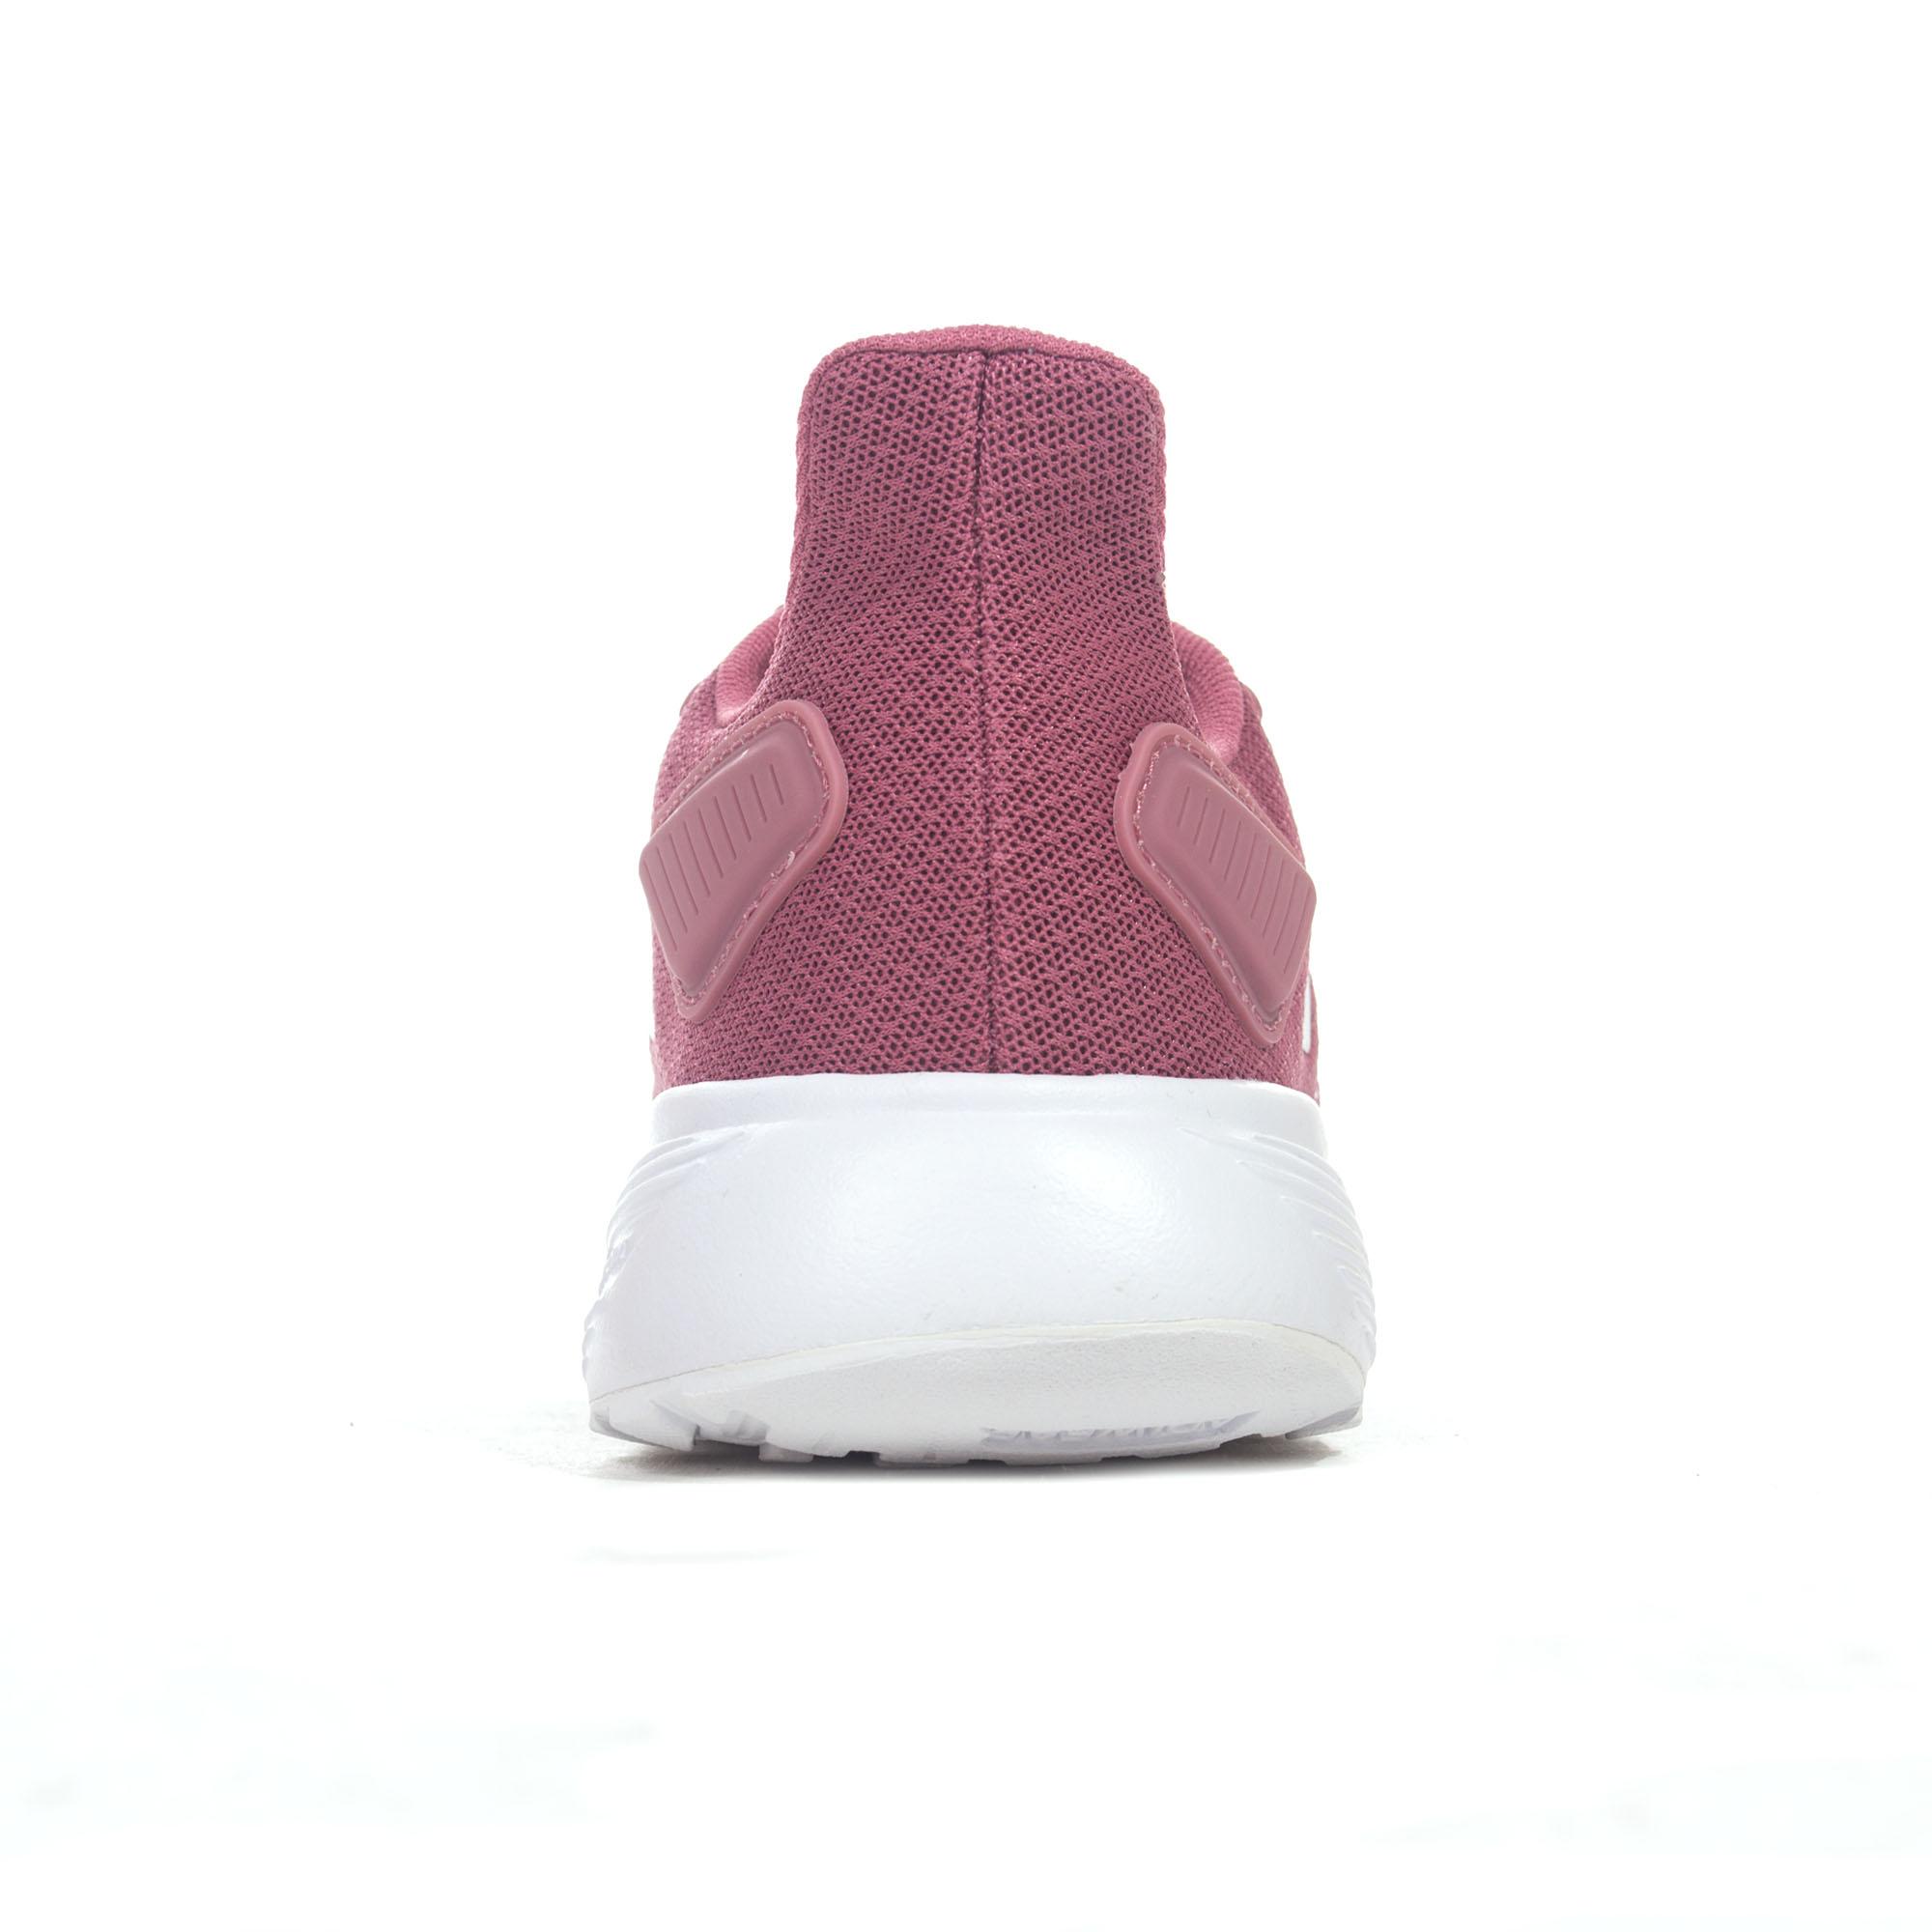 timeless design efb36 10777 Adidas Duramo 9 Womens Neutral laufen Trainer Schuh rosa